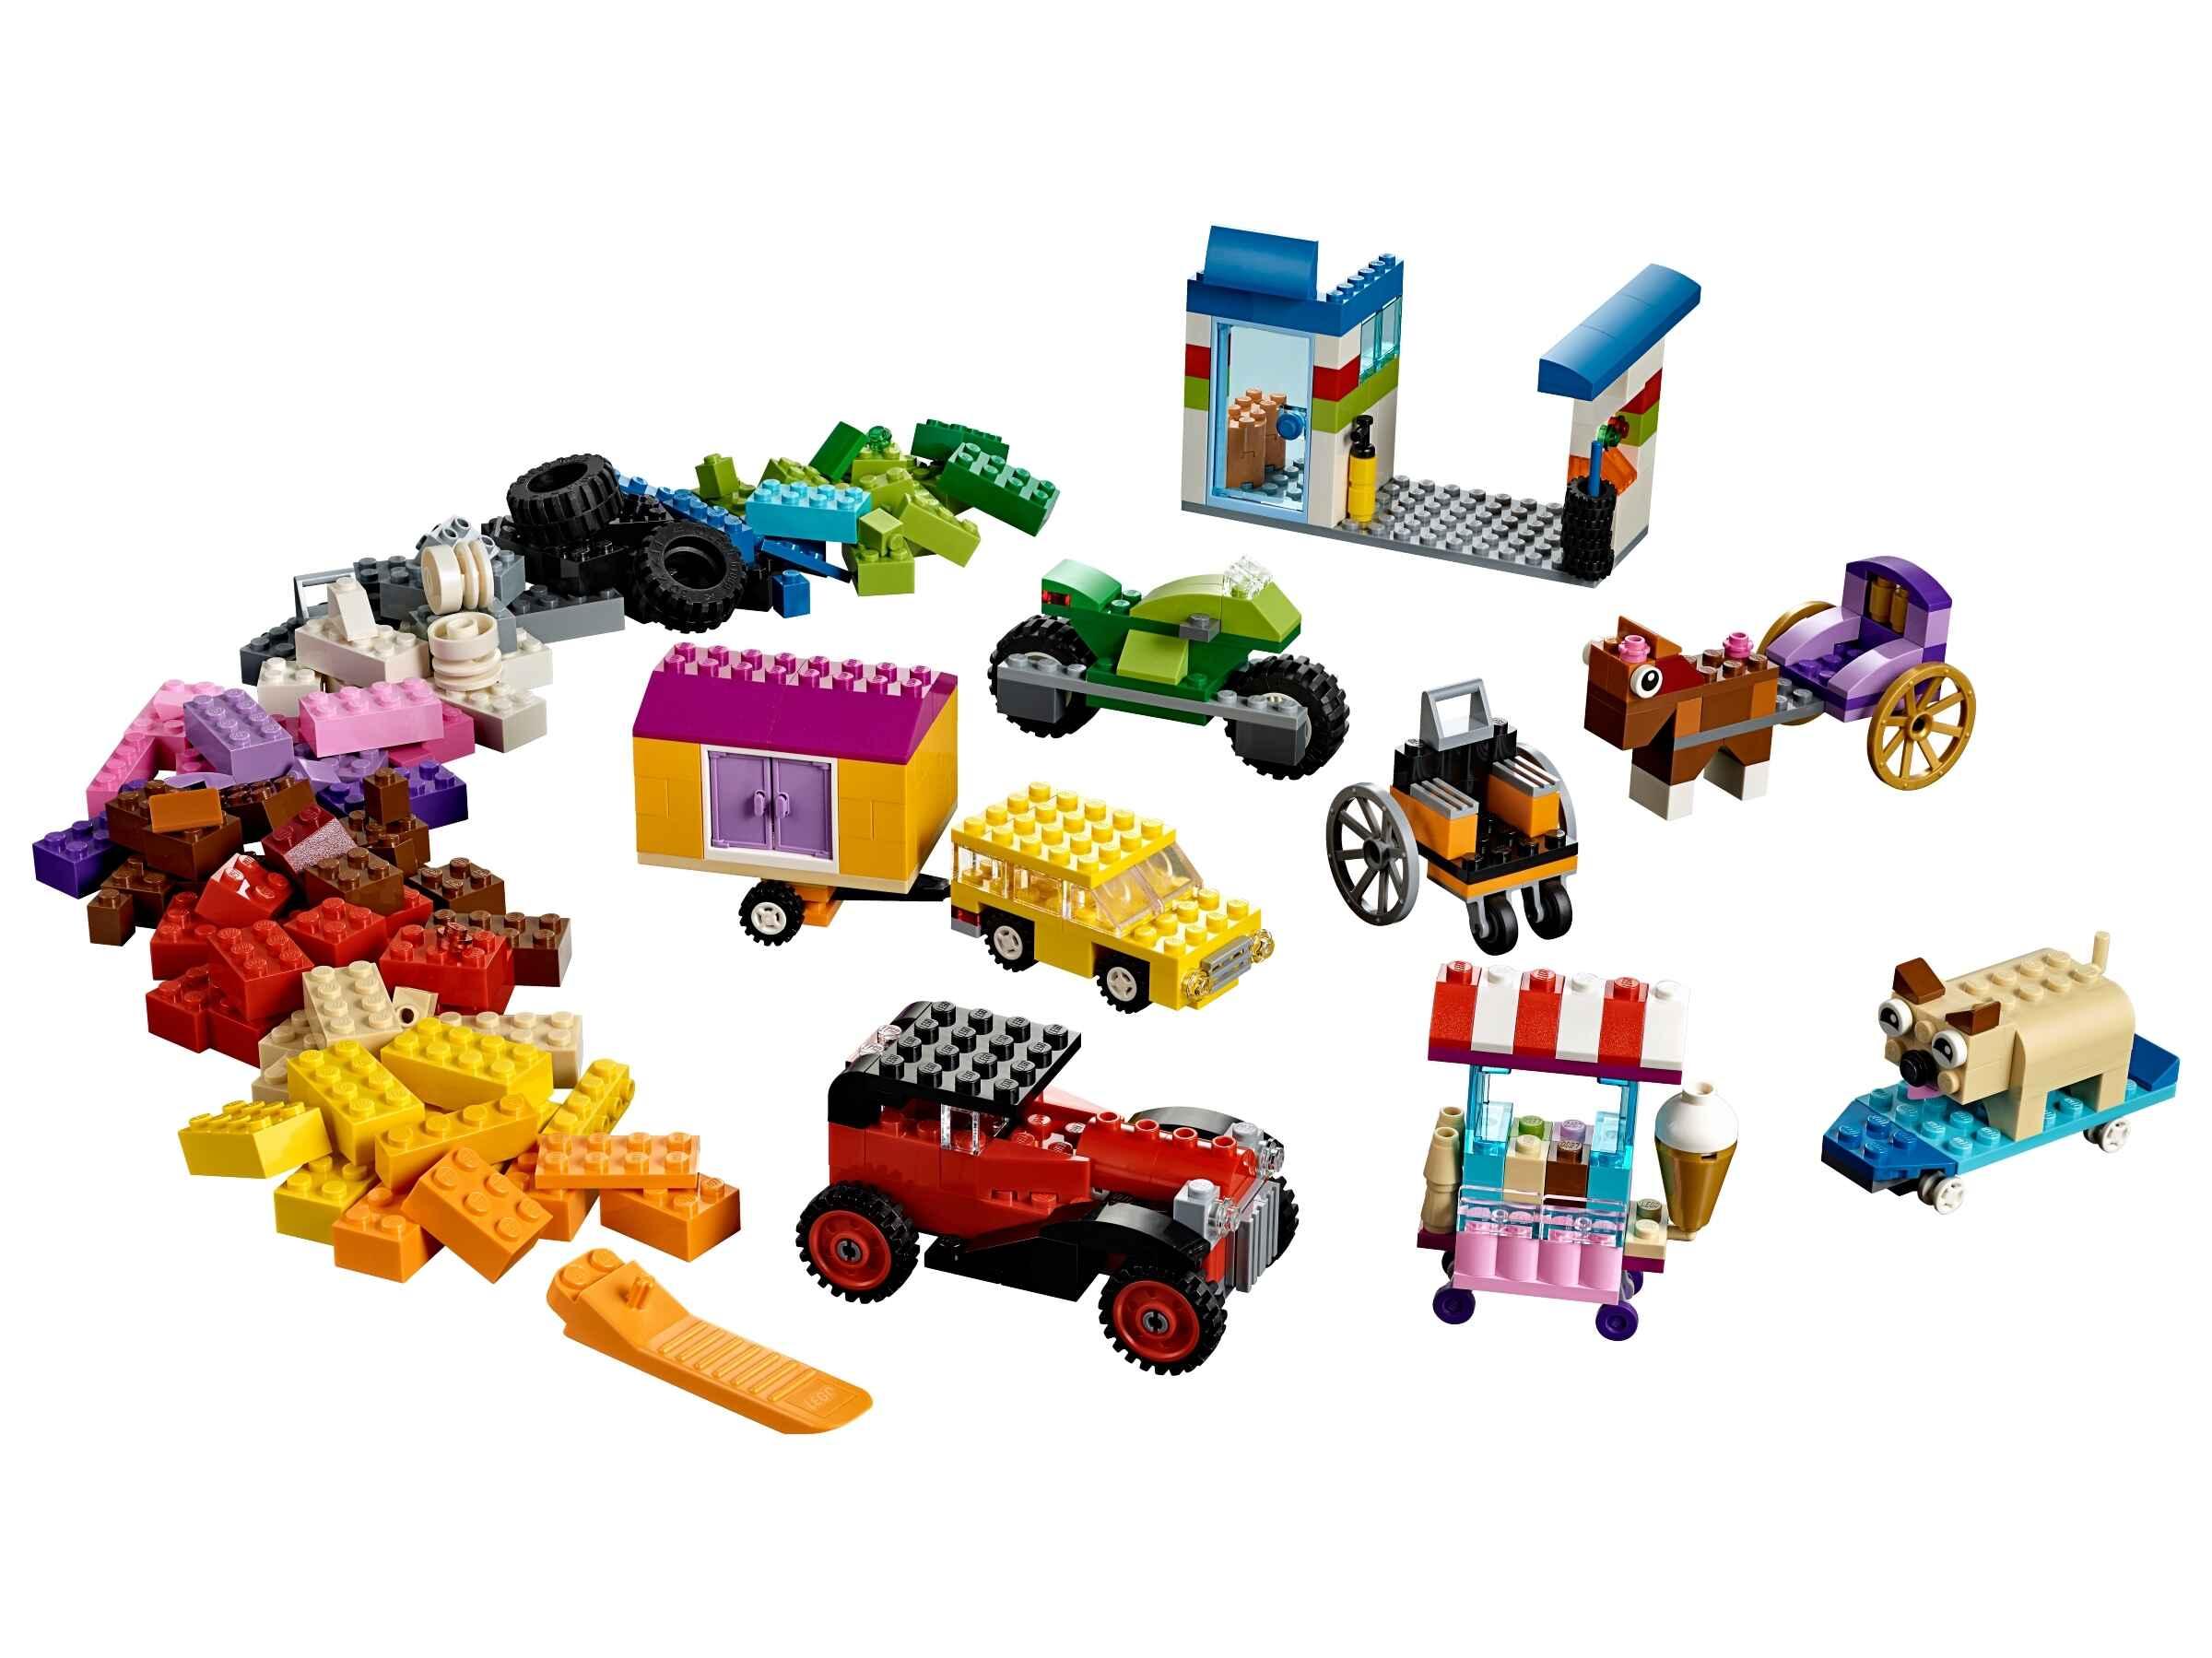 LEGO 10715 Classic Kreativ-Bauset Fahrzeuge, Bunte Bausteine (422 Teile)